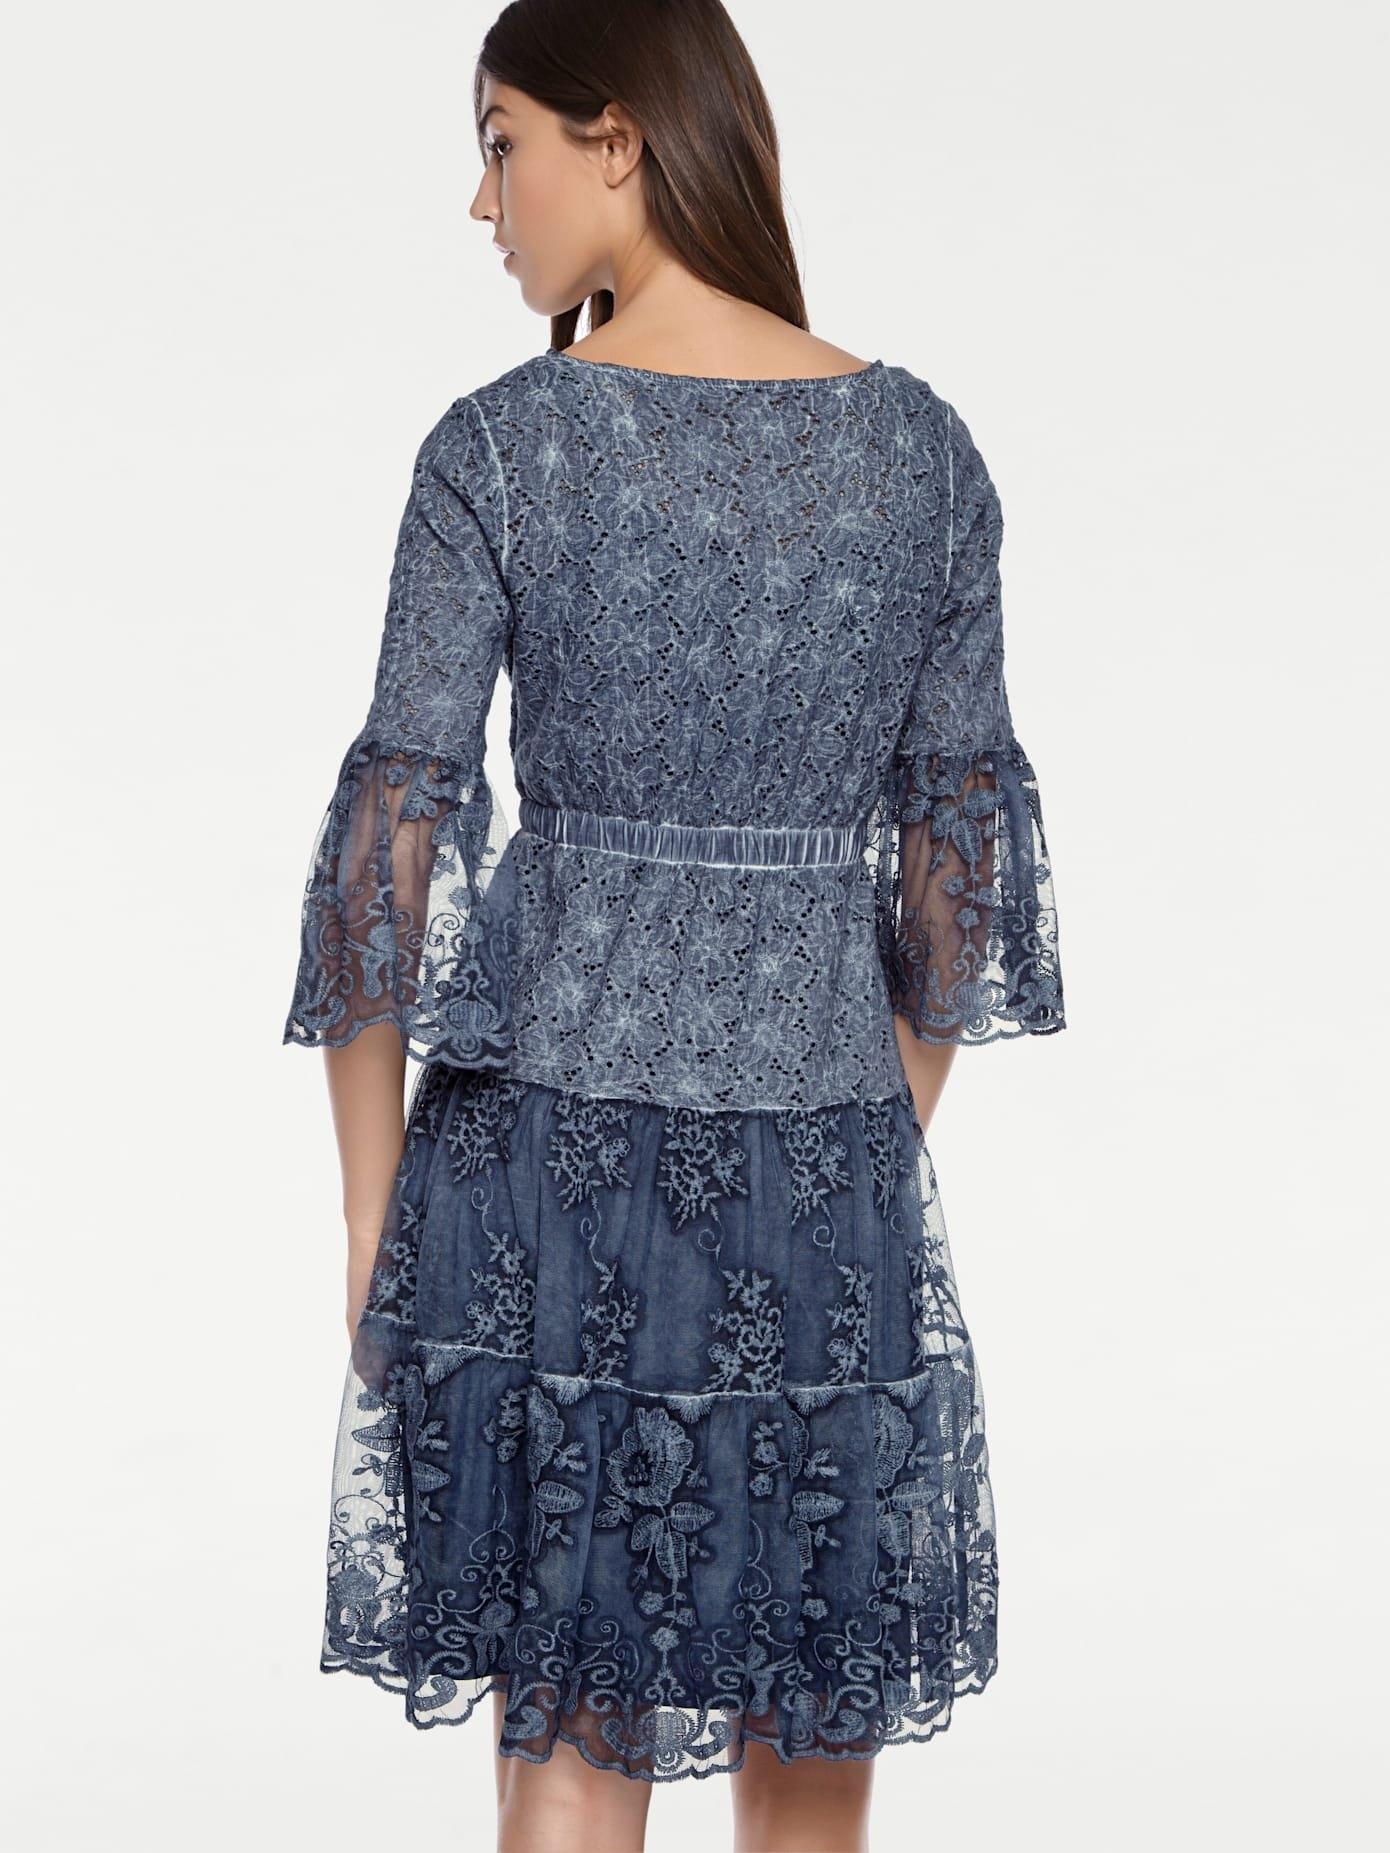 ASHLEY BROOKE by Heine kanten jurk nu online kopen bij OTTO